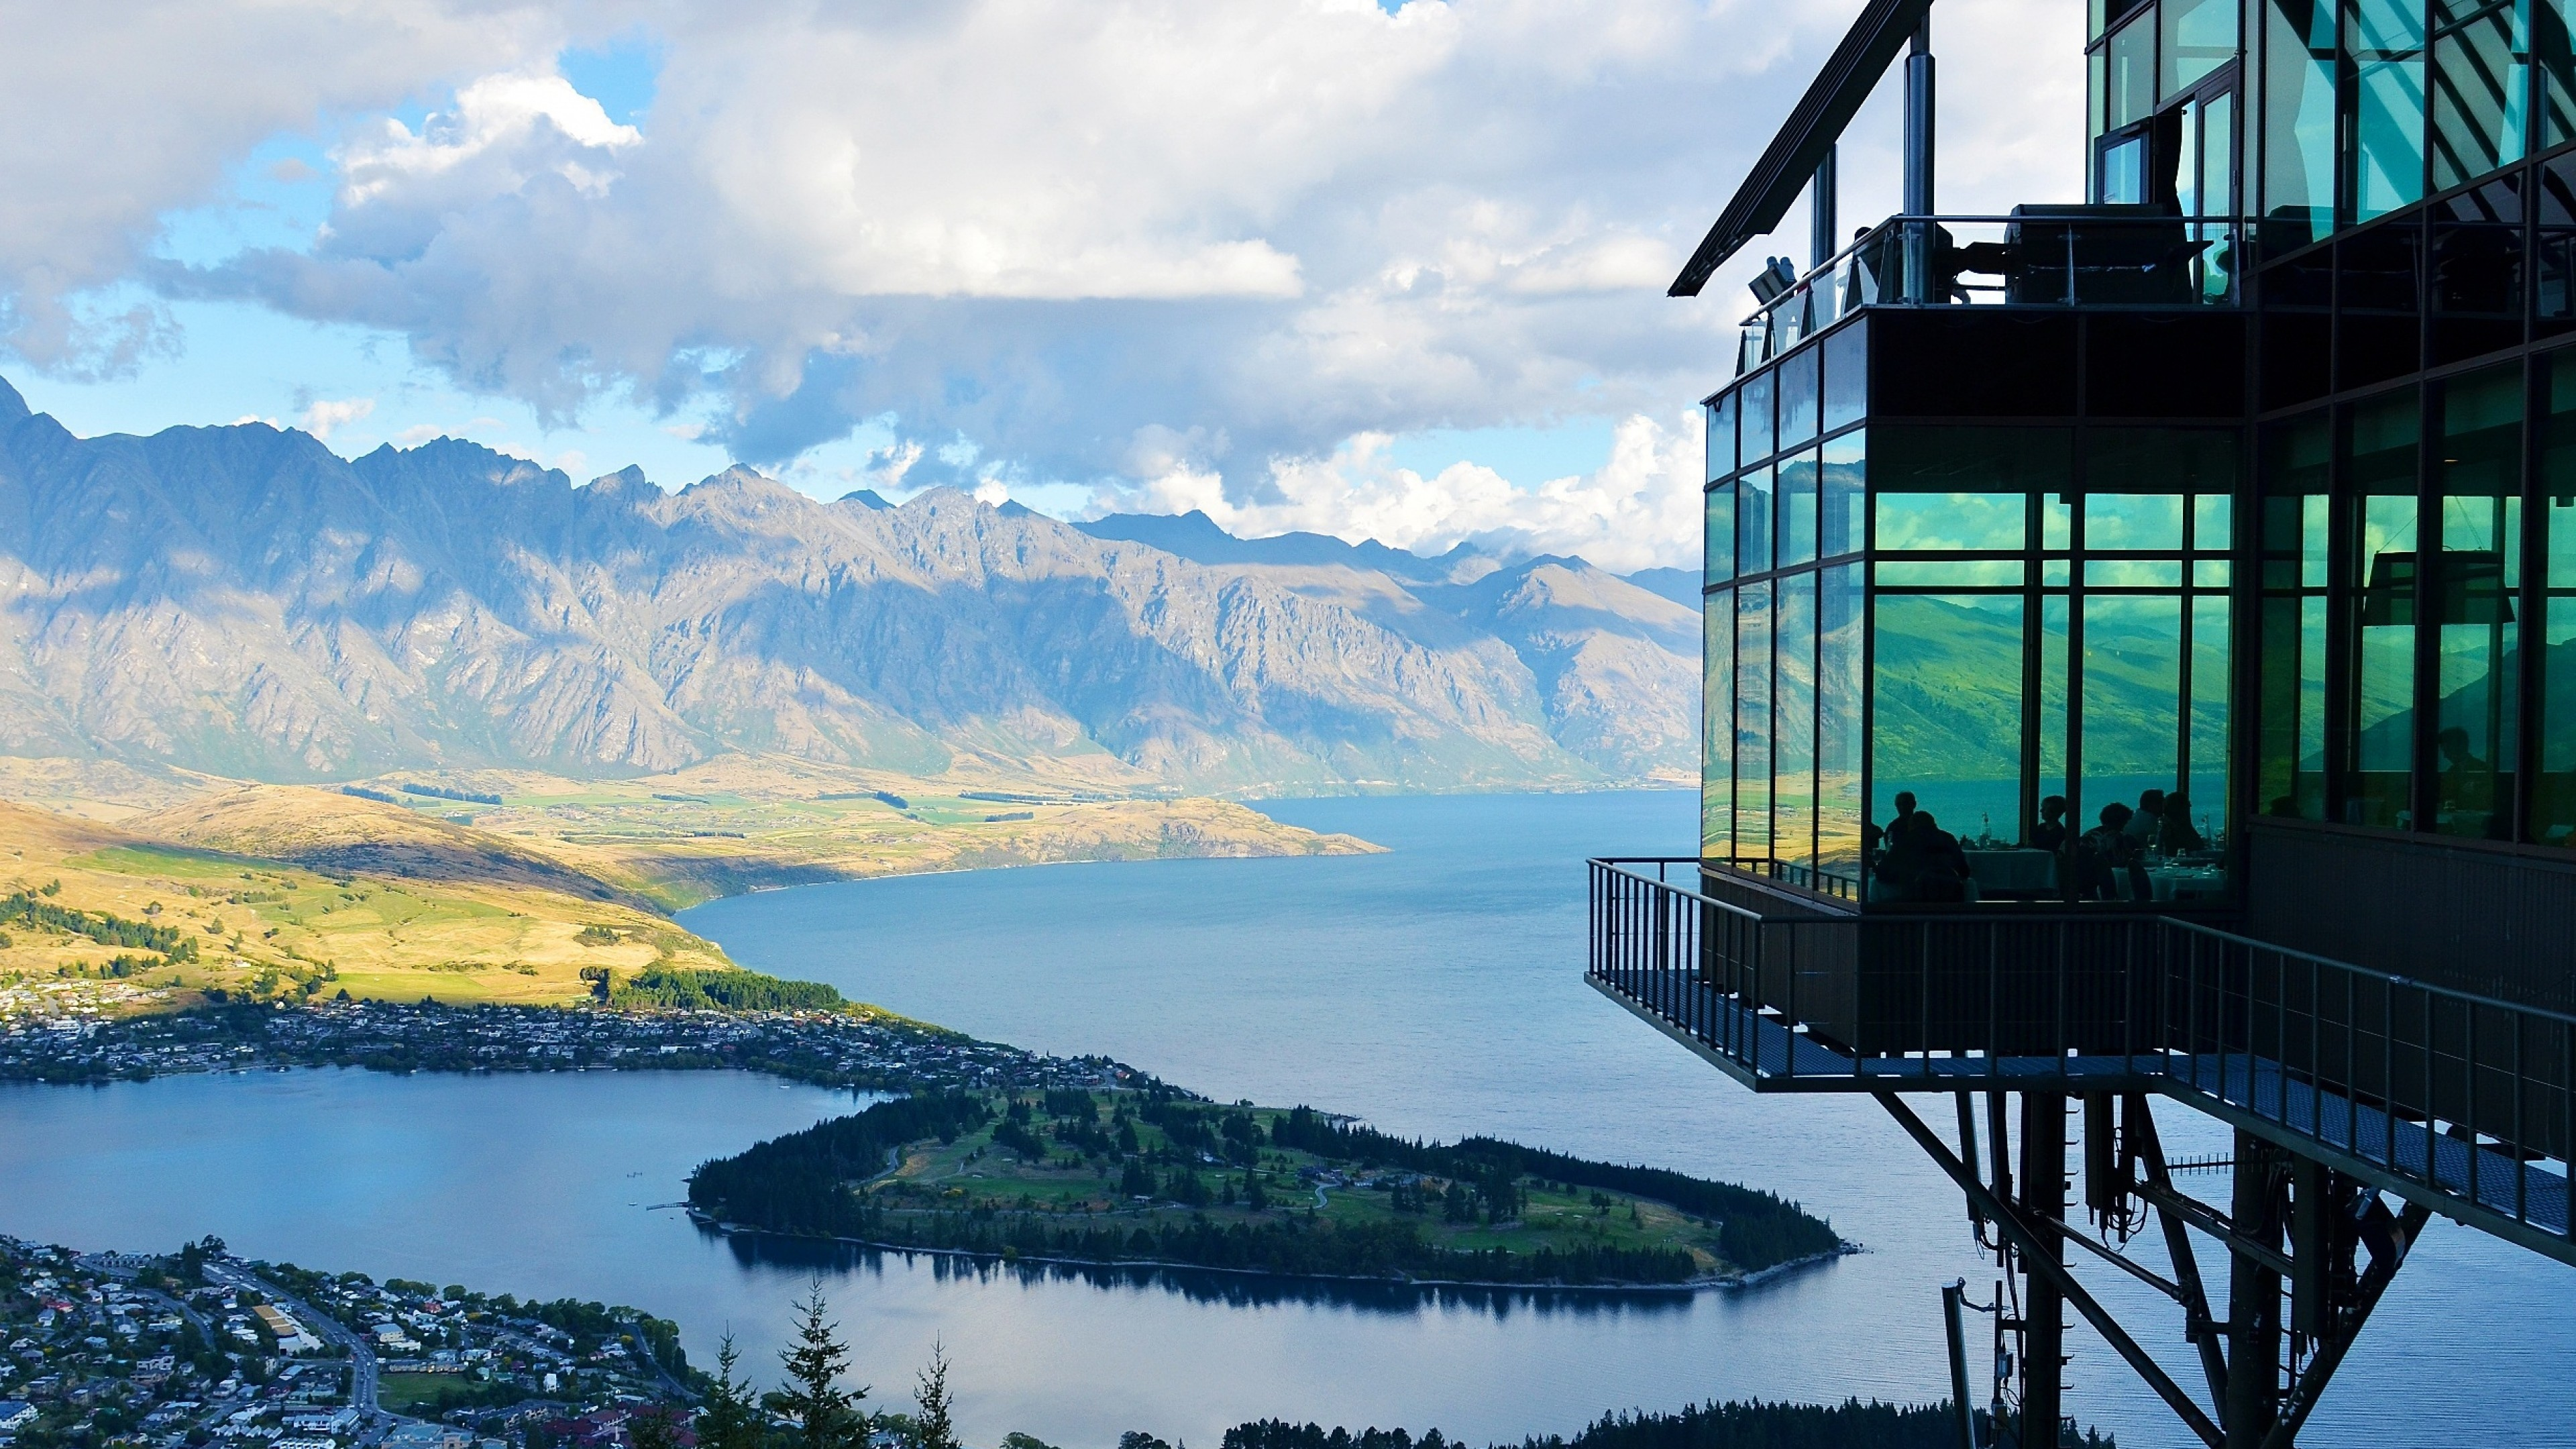 Preview Wallpaper New Zealand, Lake, Mountain, Distance - New Zealand , HD Wallpaper & Backgrounds